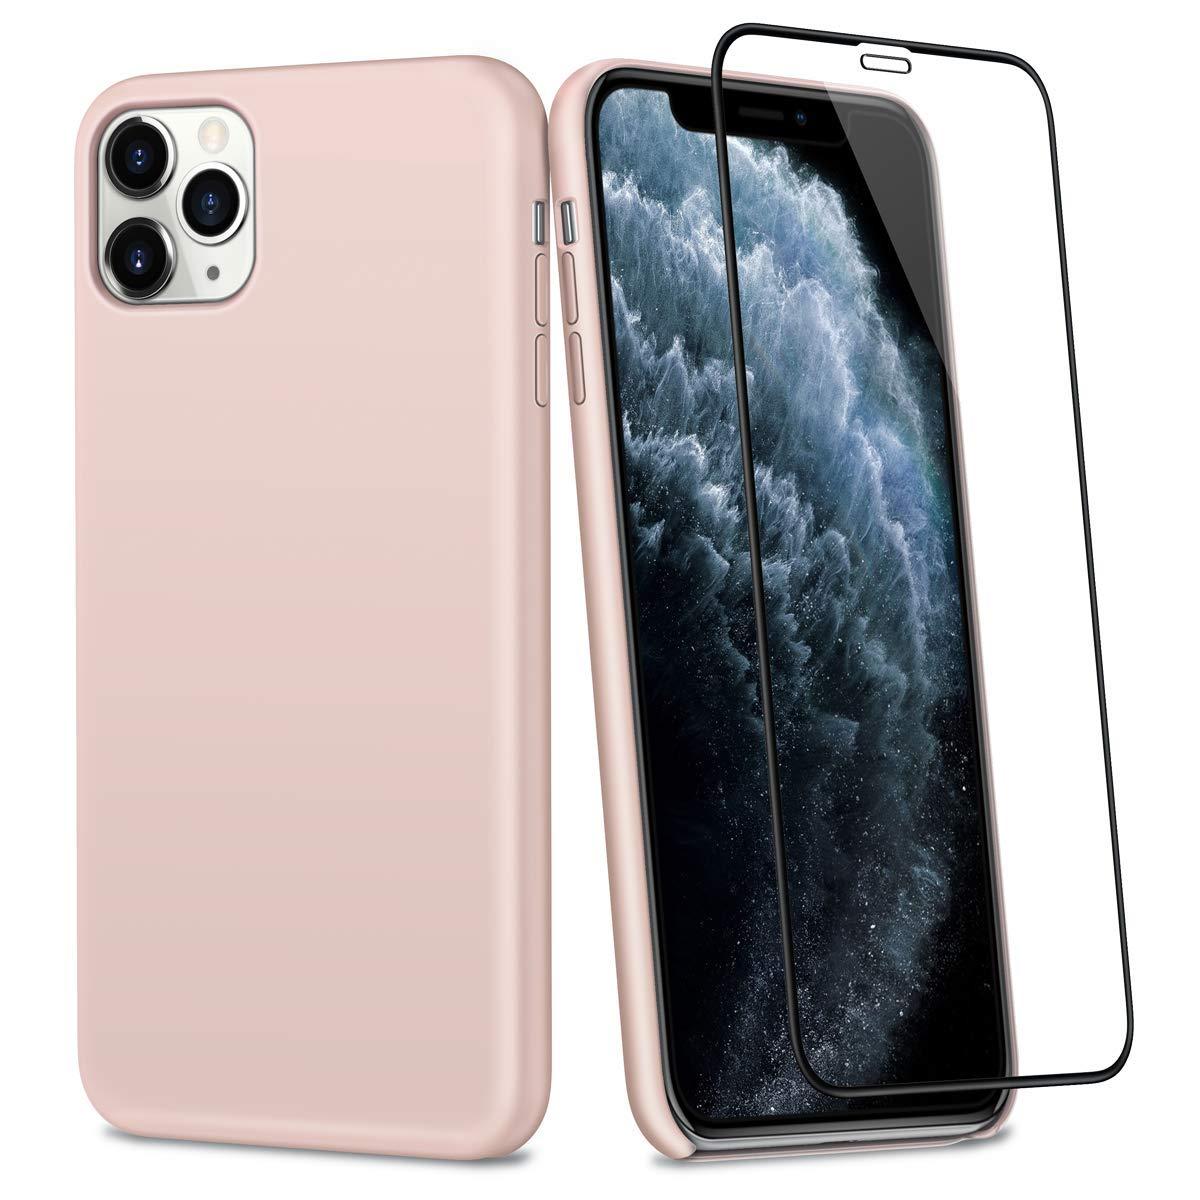 Funda + Vidrio para Iphone 11 Pro Max (6.5) AEMOTOY [7X82HJL